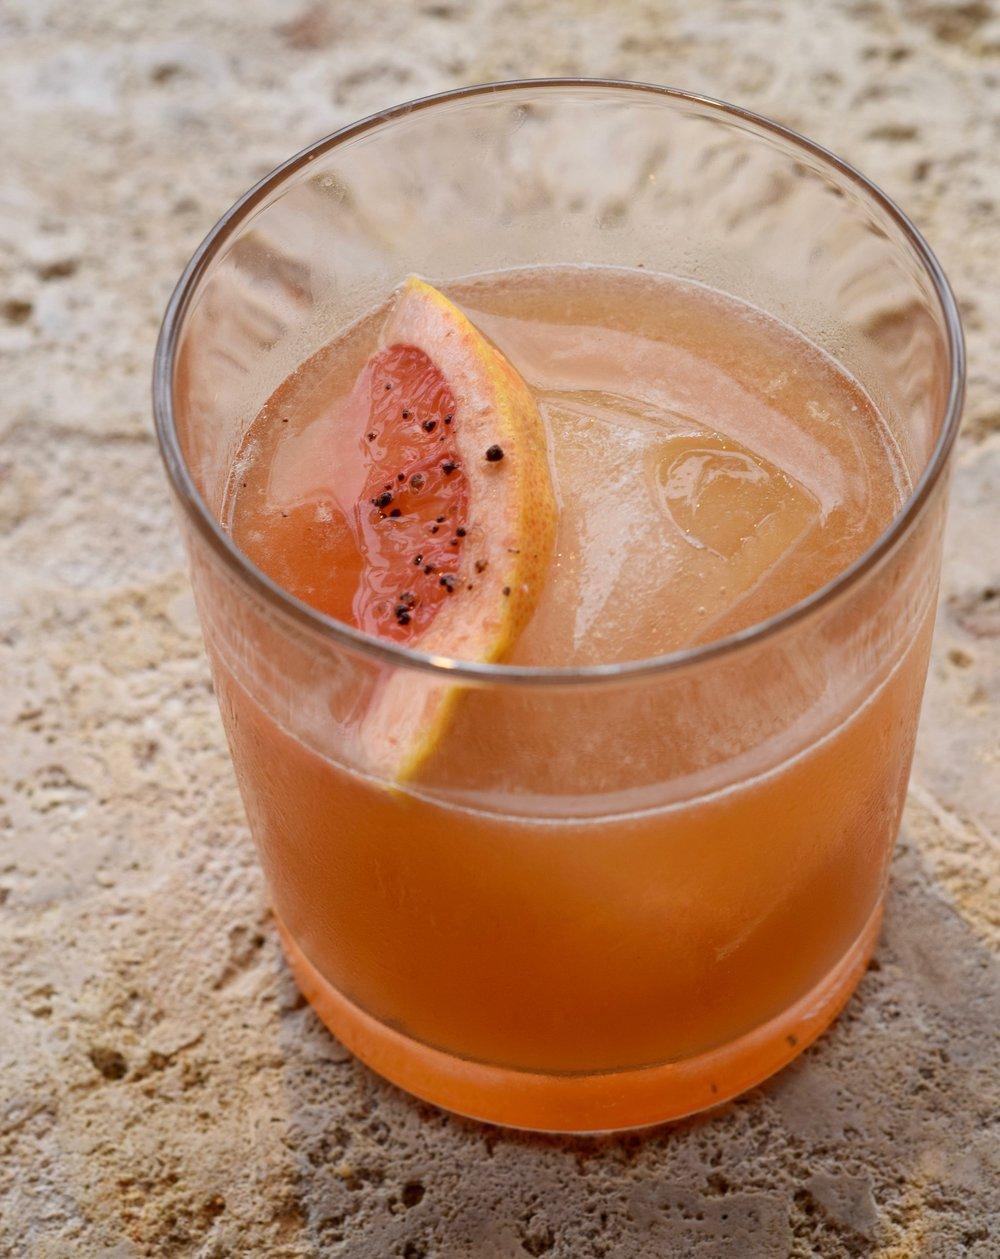 BEAR HUG - 2 oz bourbon1/2 oz nostrum grapefruit piloncillo chipotle shrub1/2 oz fresh lemon juice1/2 oz honey syrup2 dashes angostura bittersShake with ice and strain.